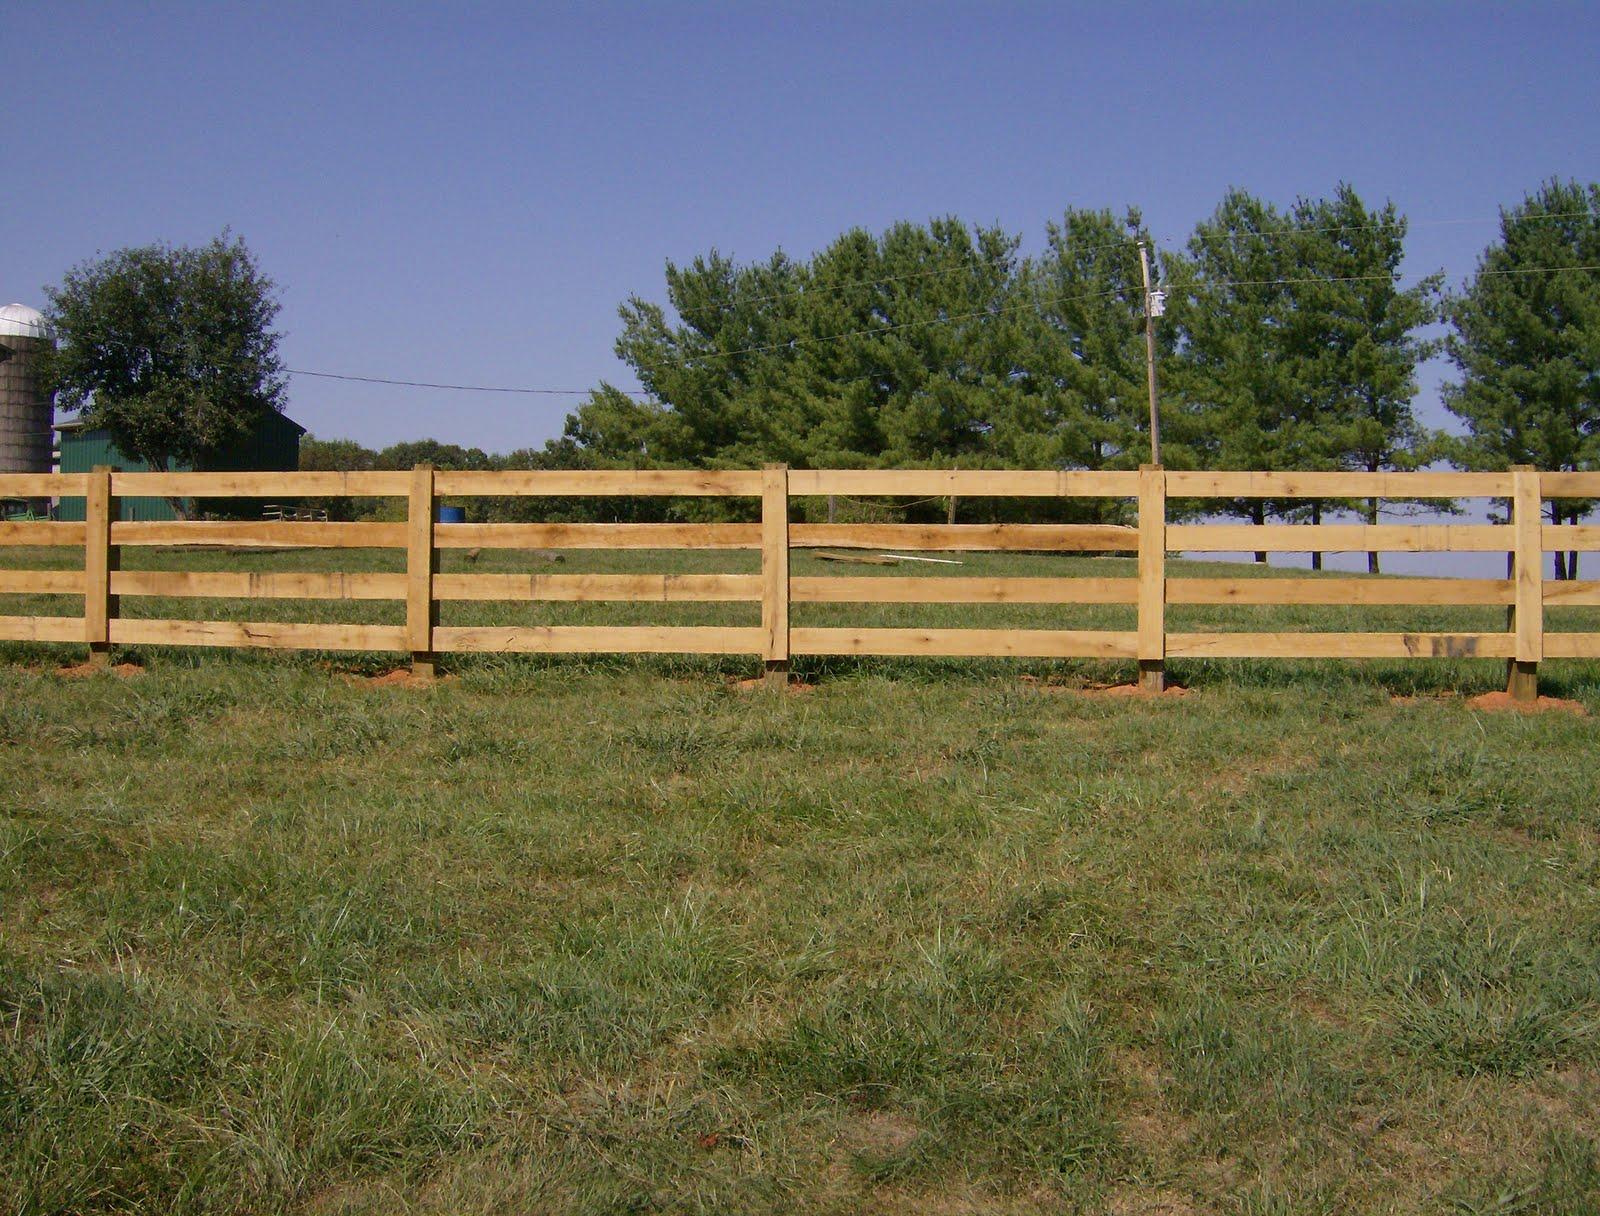 Larry chattin sons farm fencing